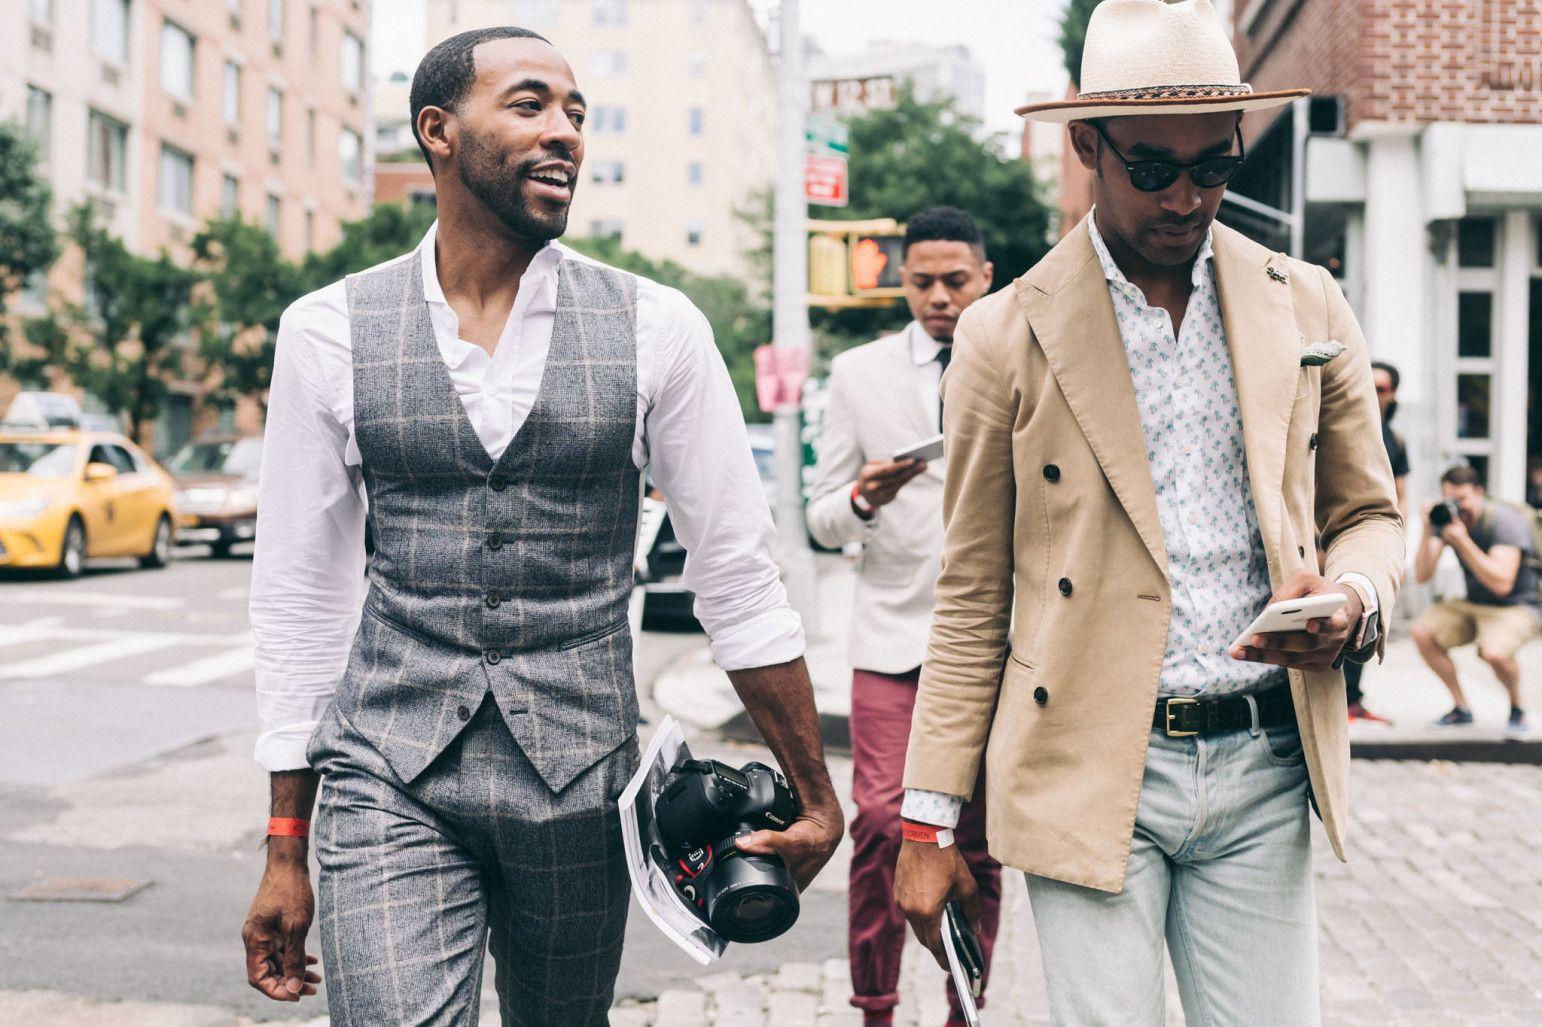 57465d58c98 New York Fashion Week  Men s Spring 2017 Street Style Takes Over Manhattan  - -Wmag